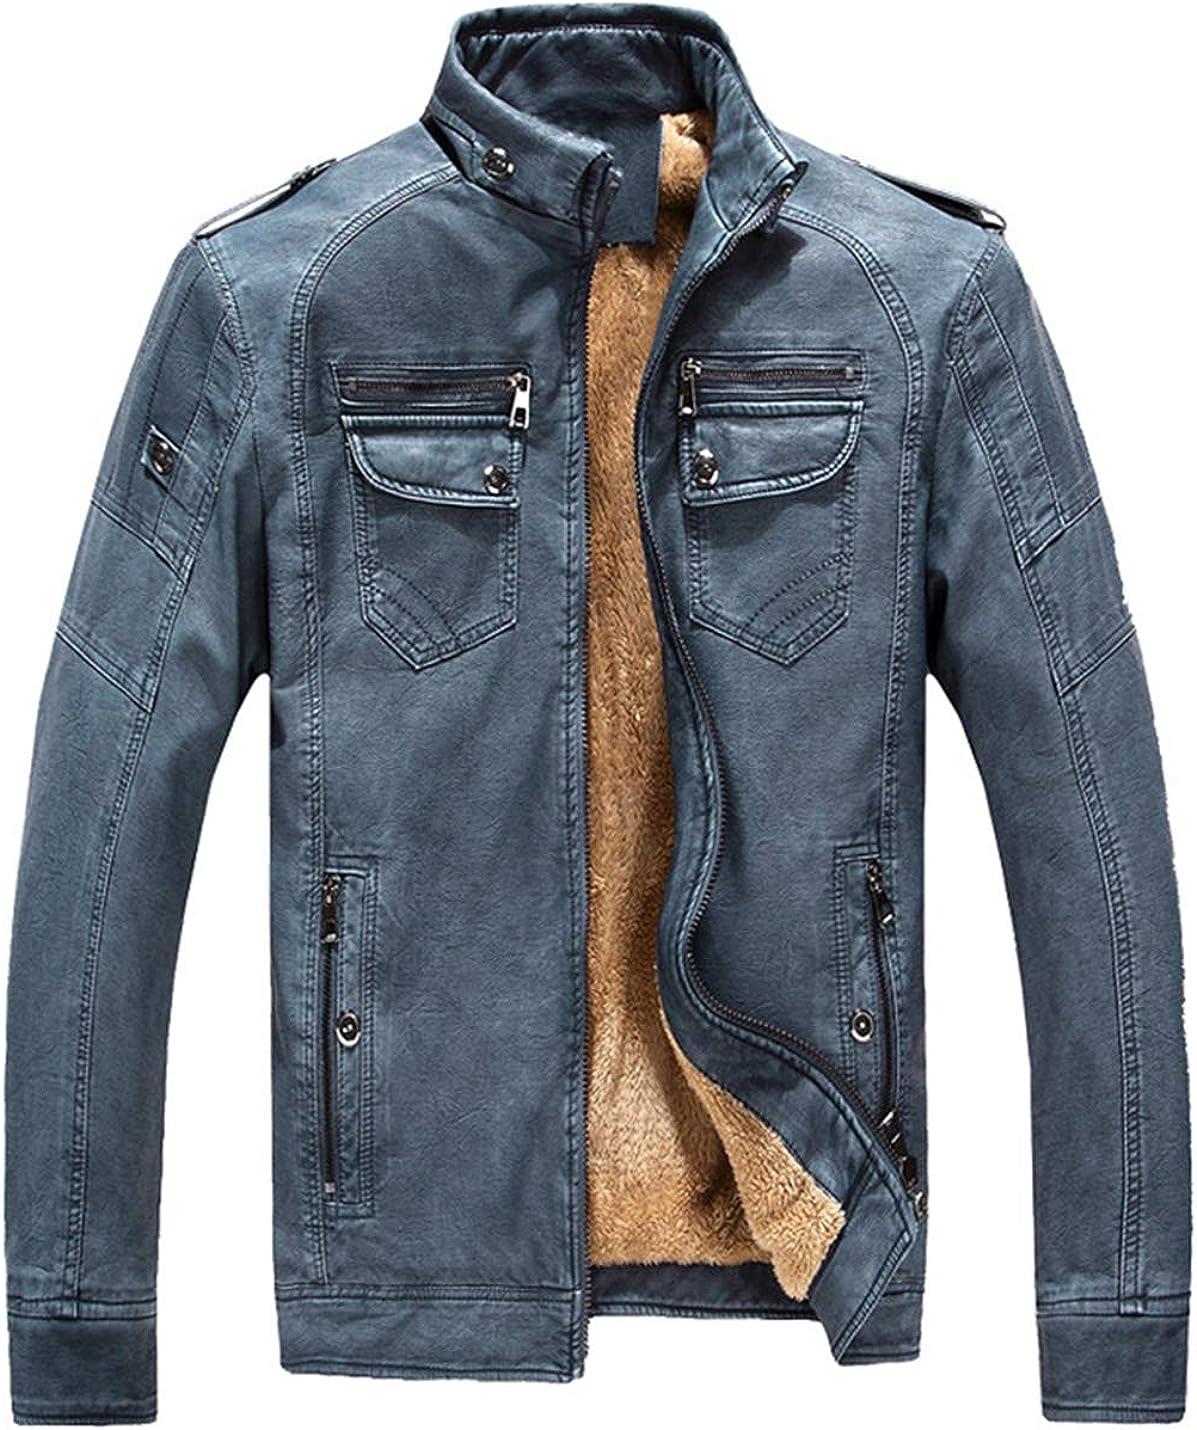 Lentta Men's Vintage Stand Collar Long Sleeve Zipper Faux Leather Fleece Jacket Coat